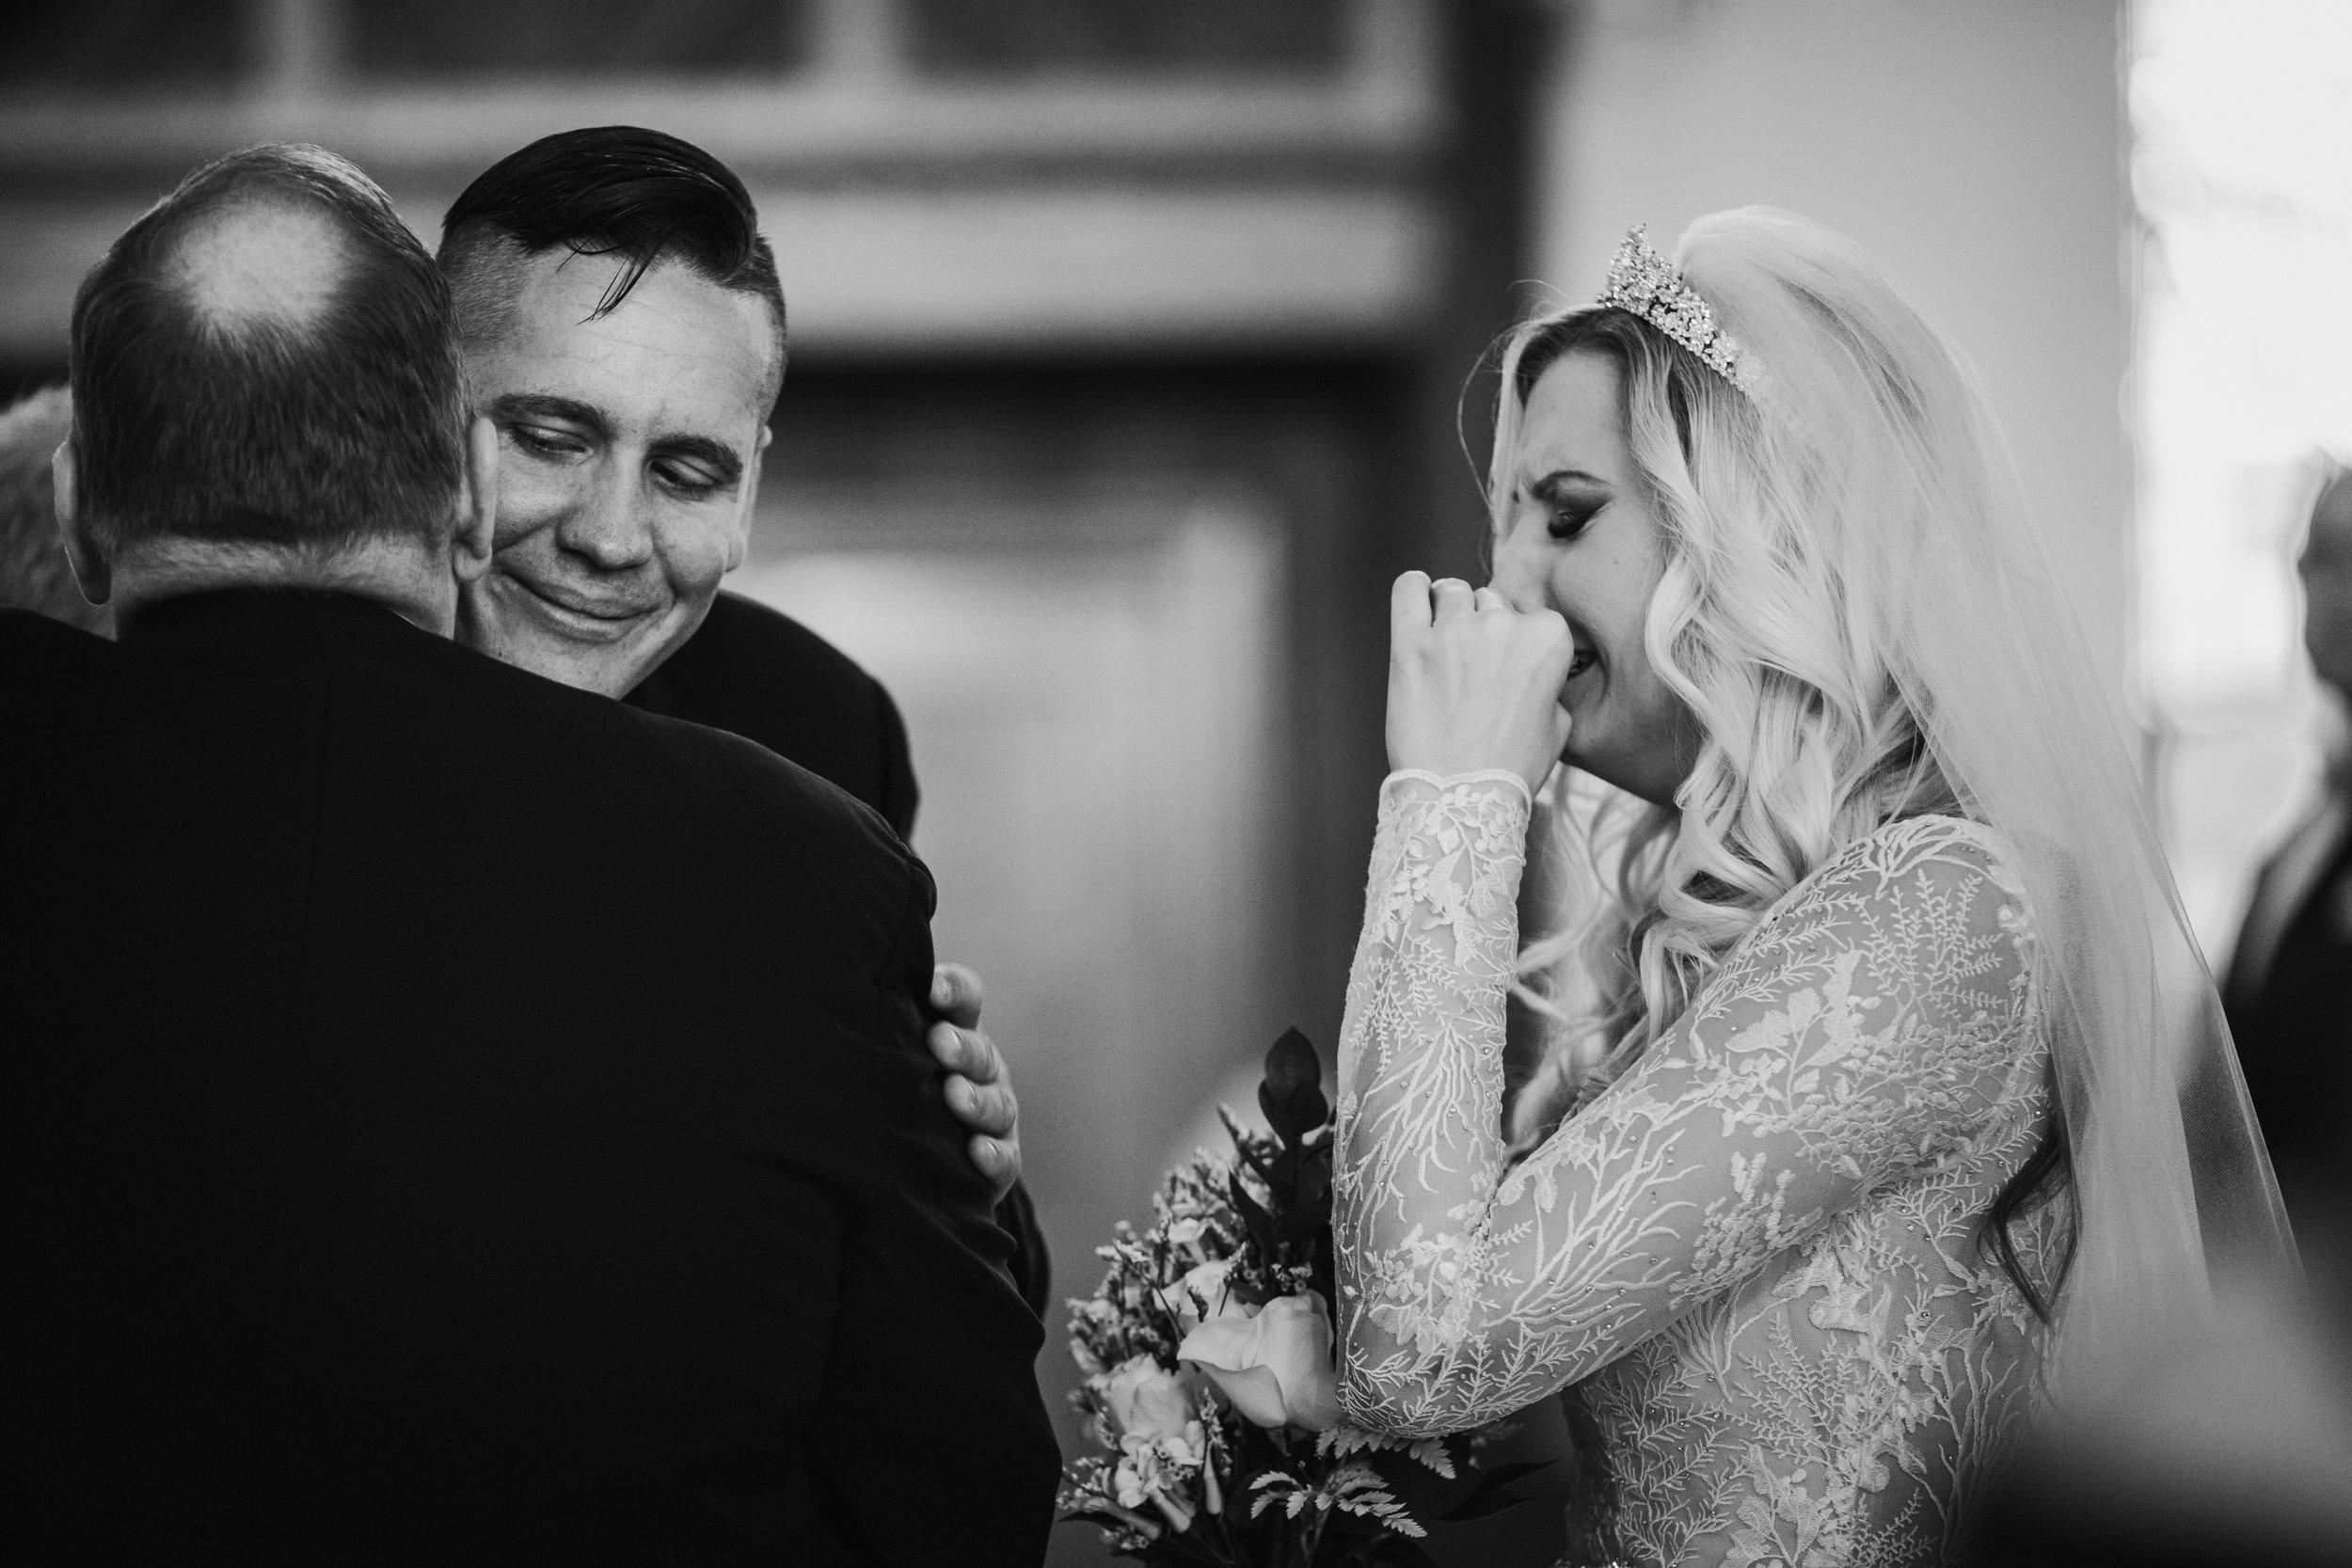 Marian-House-NJ-Wedding-JennaLynnPhotography-AliPaul-CeremonyBW-47.jpg